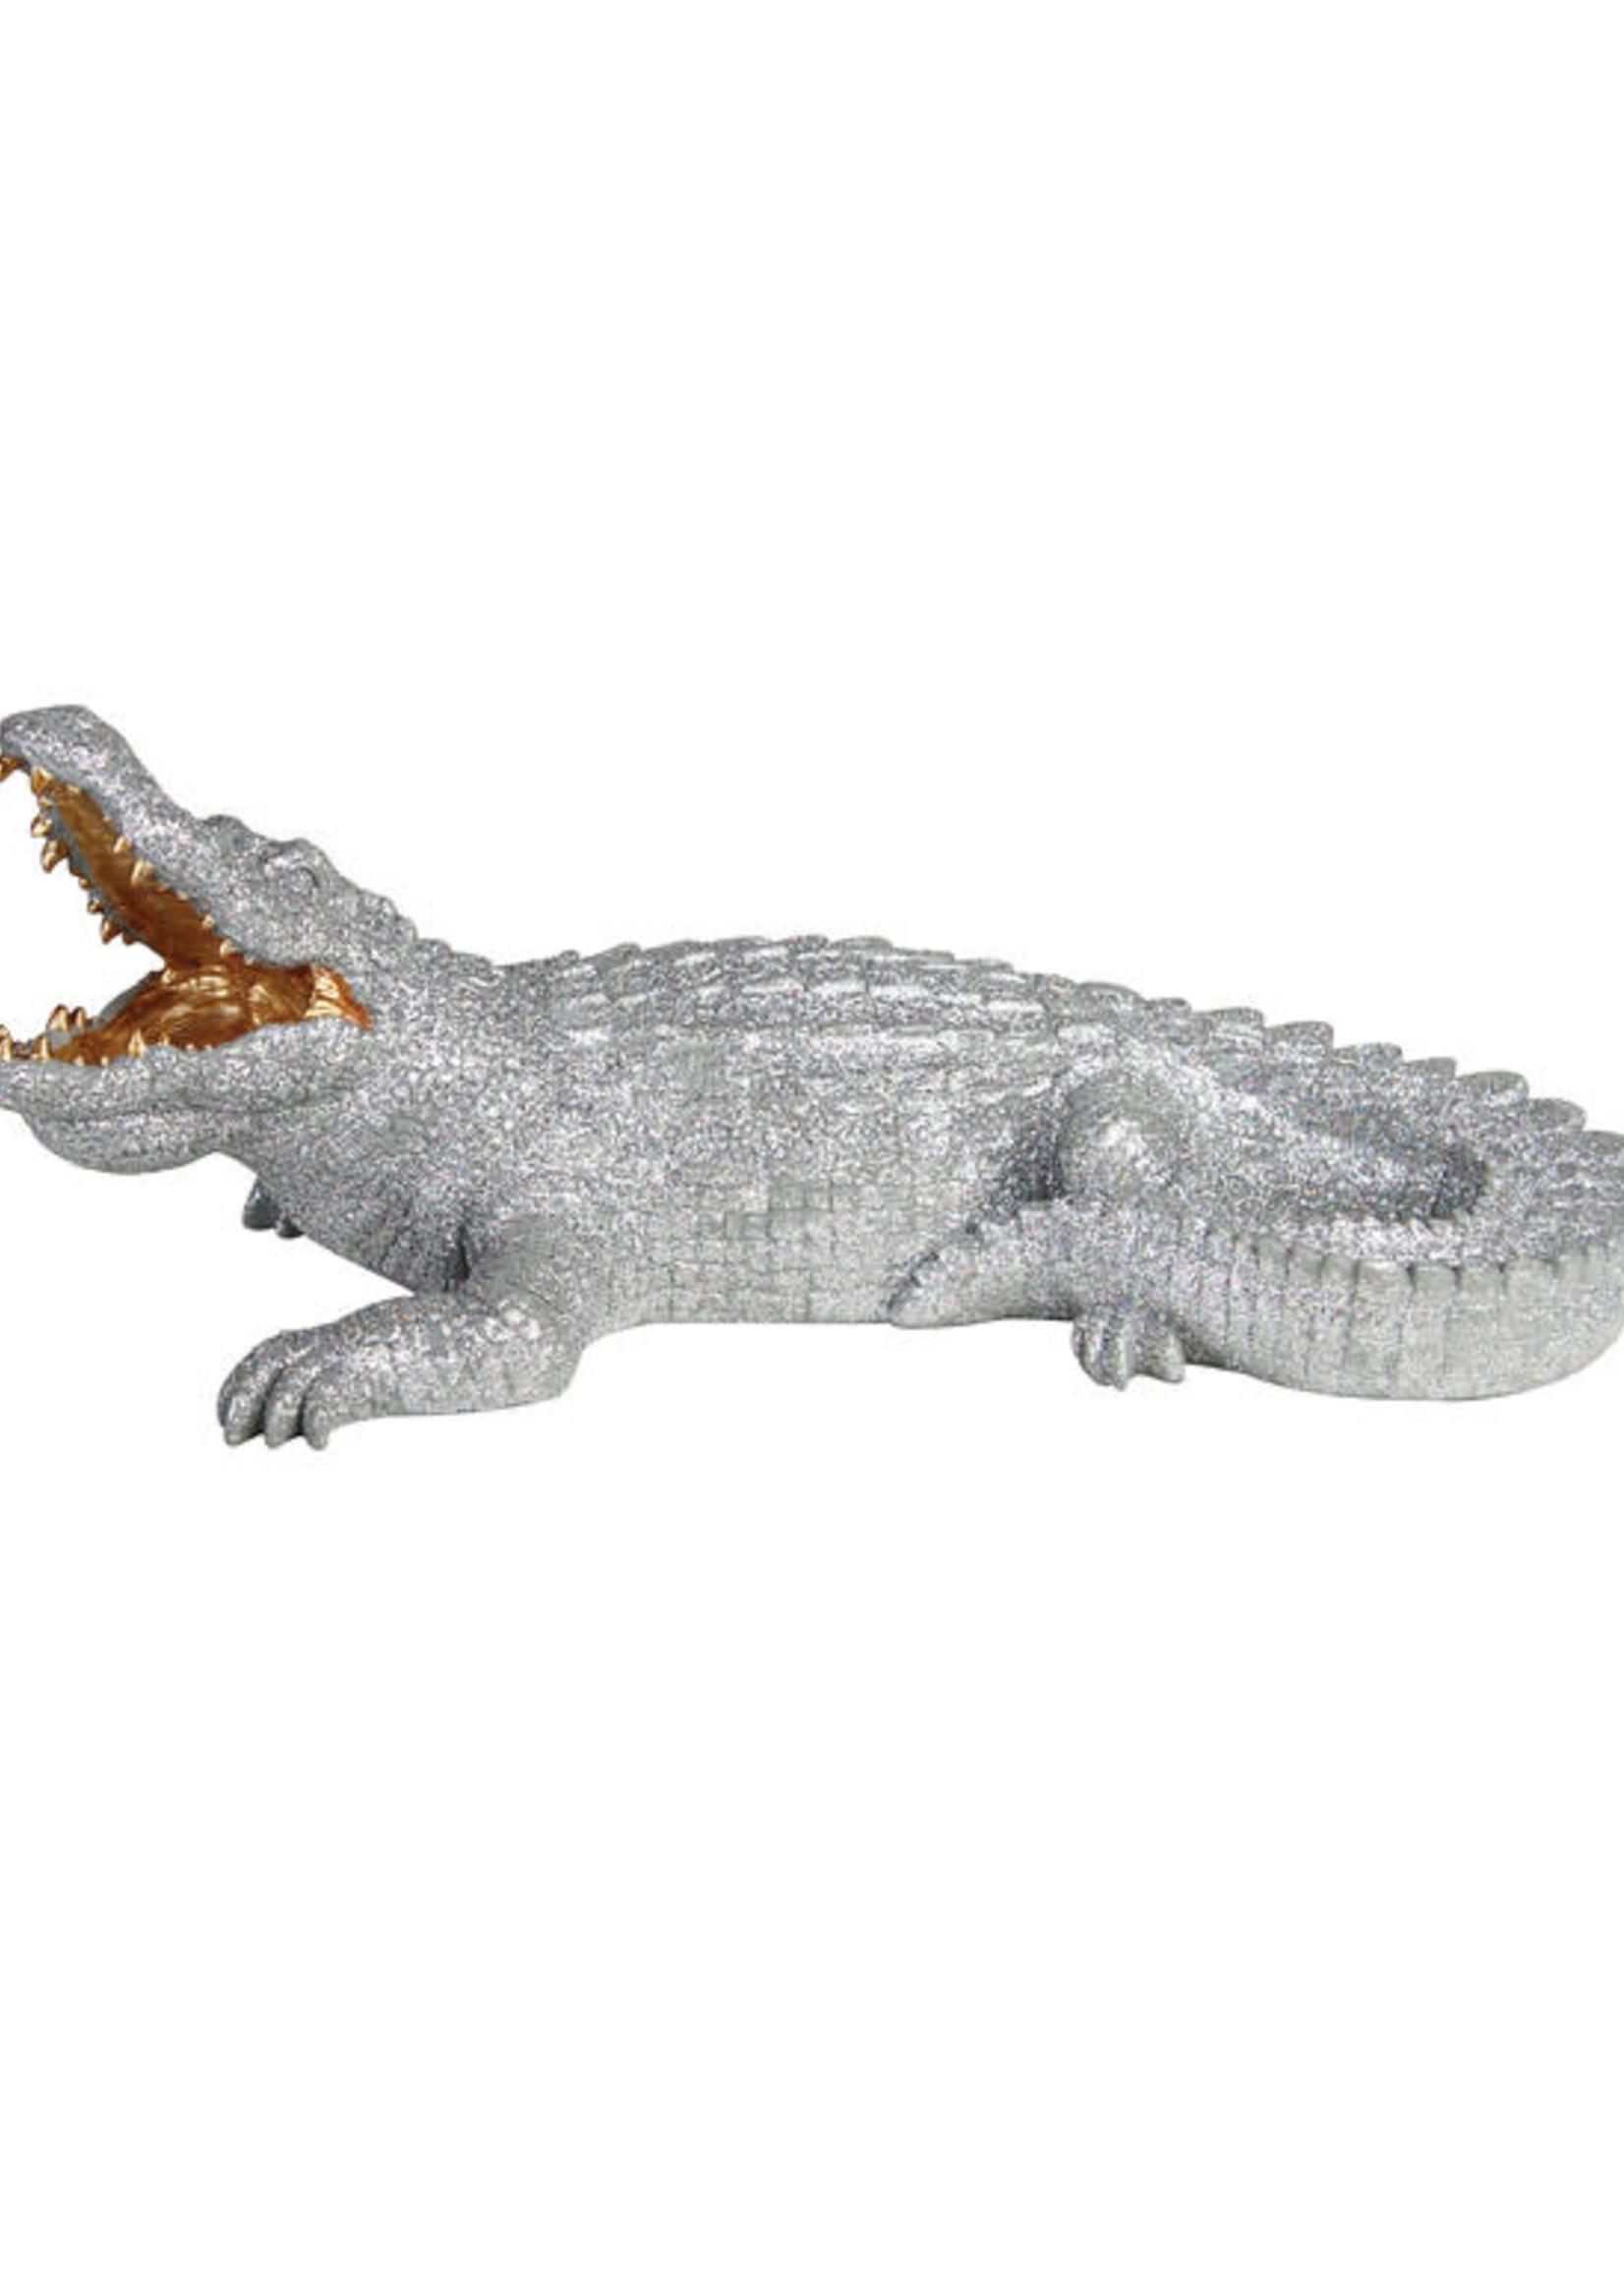 &Klevering Coinbank crocodile glitter